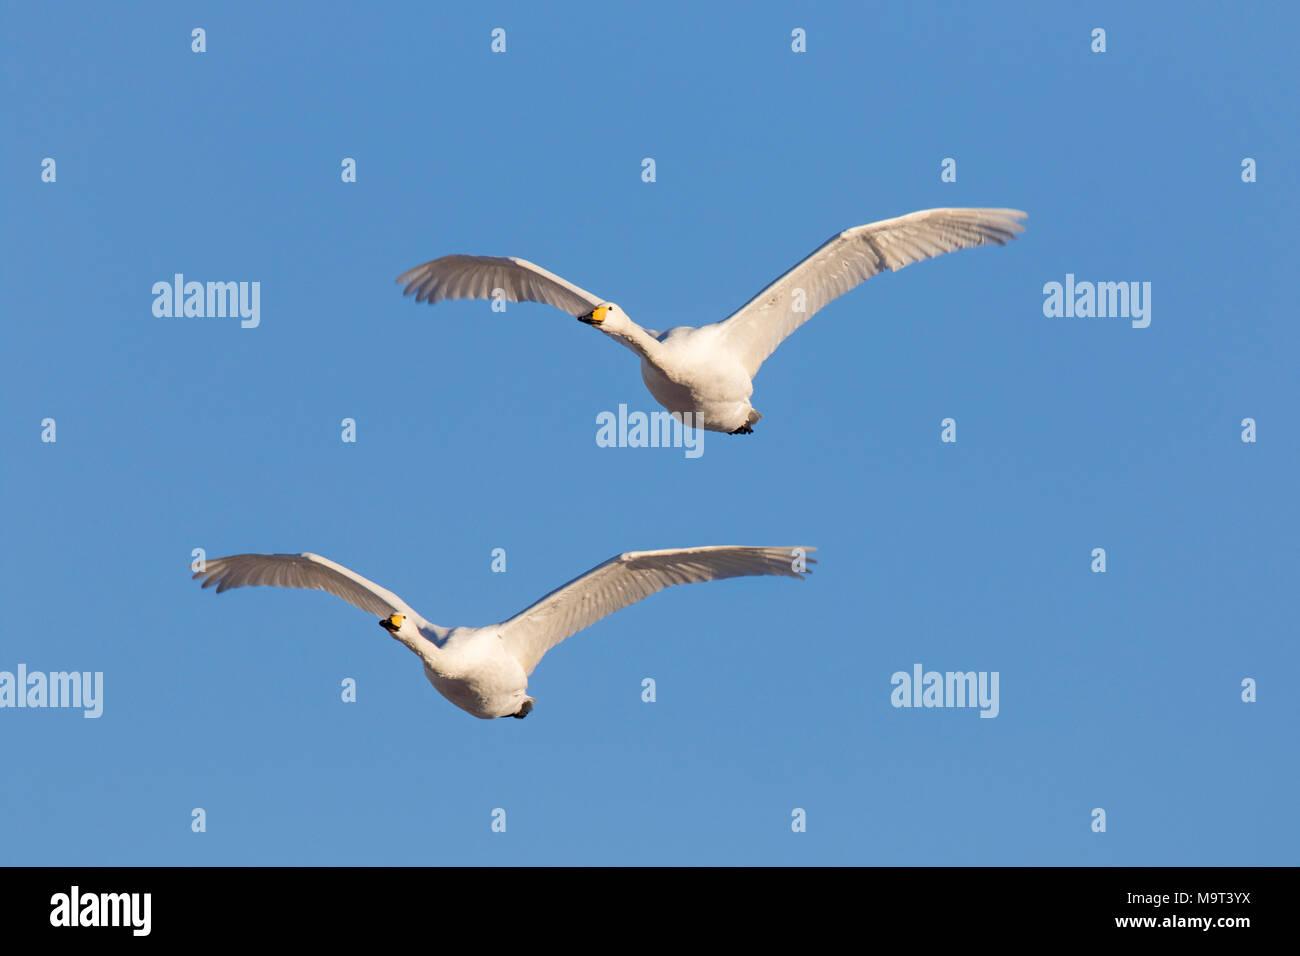 Deux cygnes chanteurs (Cygnus cygnus) en vol sur fond de ciel bleu Photo Stock